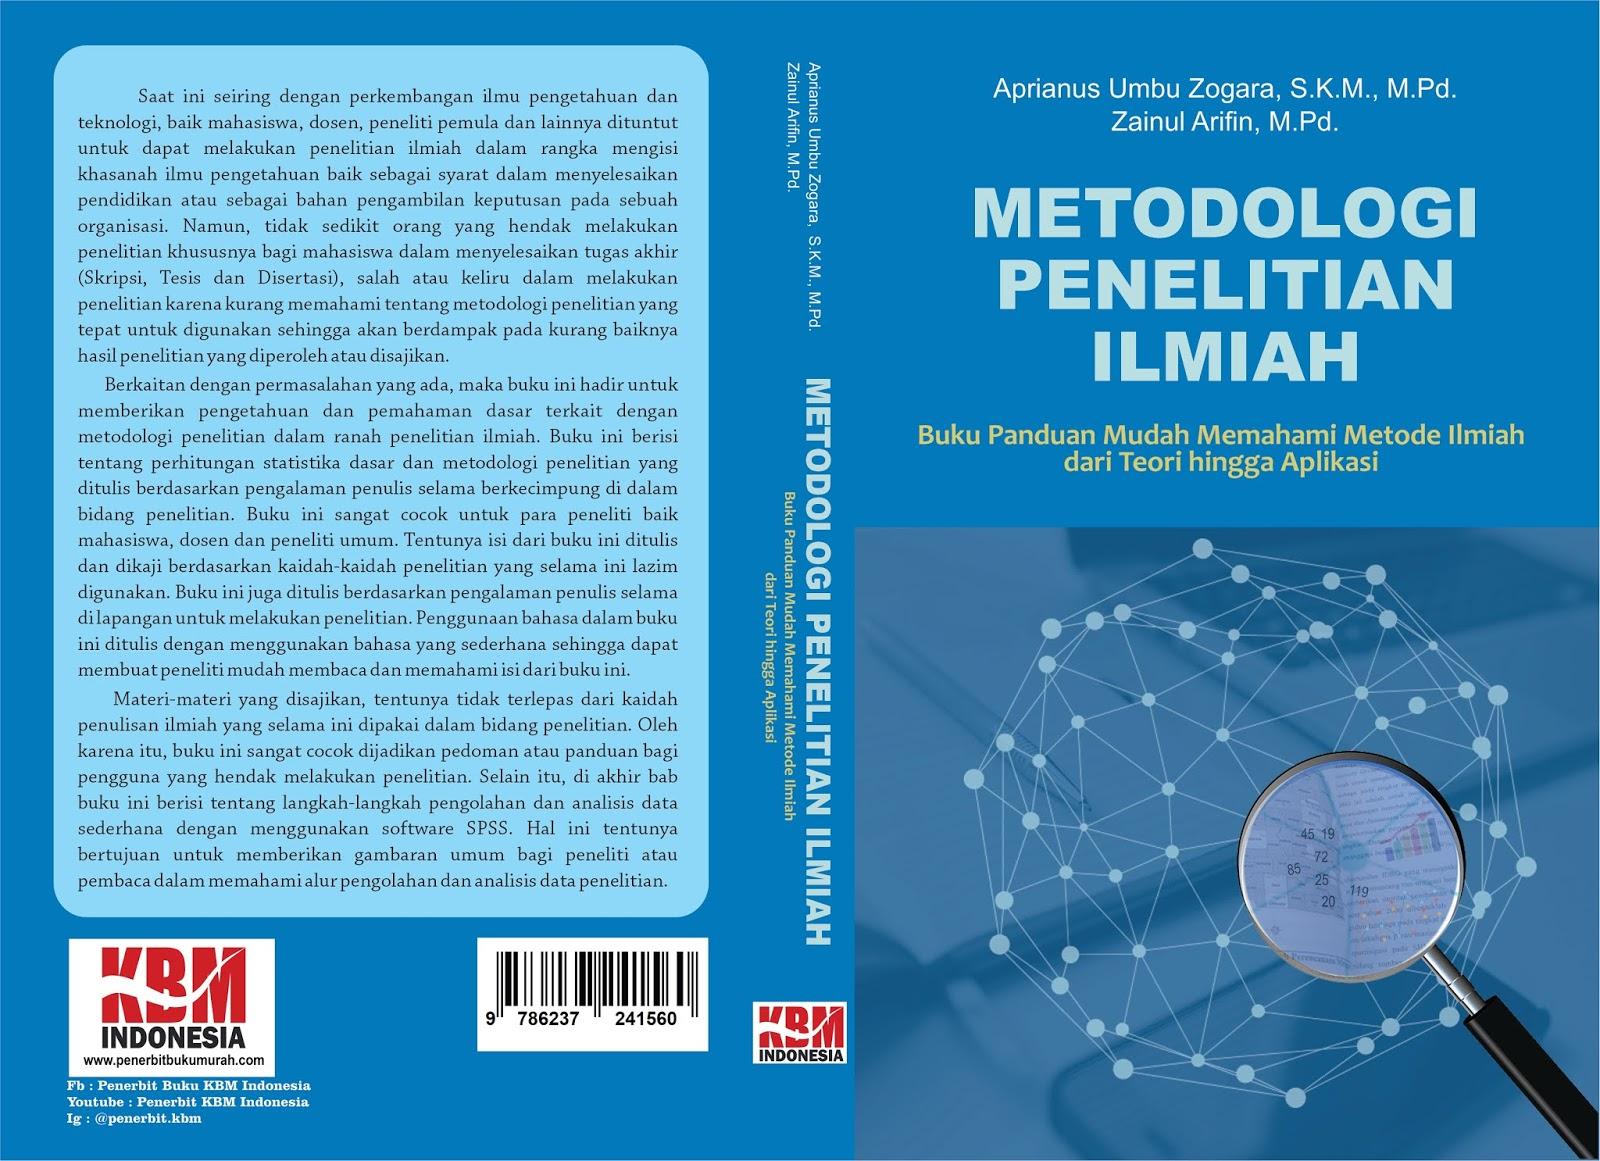 METODOLOGI PENELITIAN ILMIAH